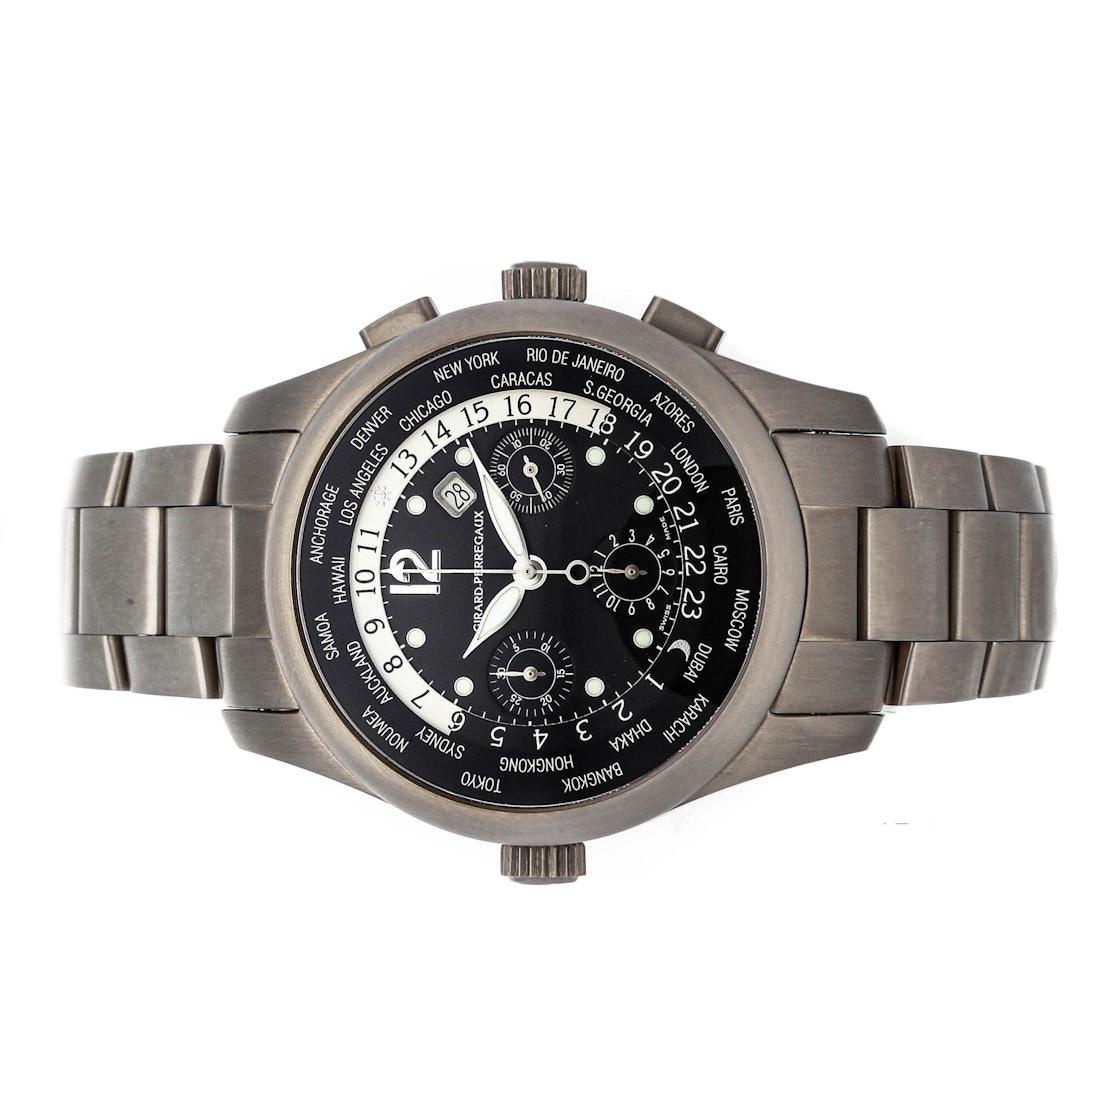 Girard-Perregaux WW.TC Chronograph 49800.T.216046